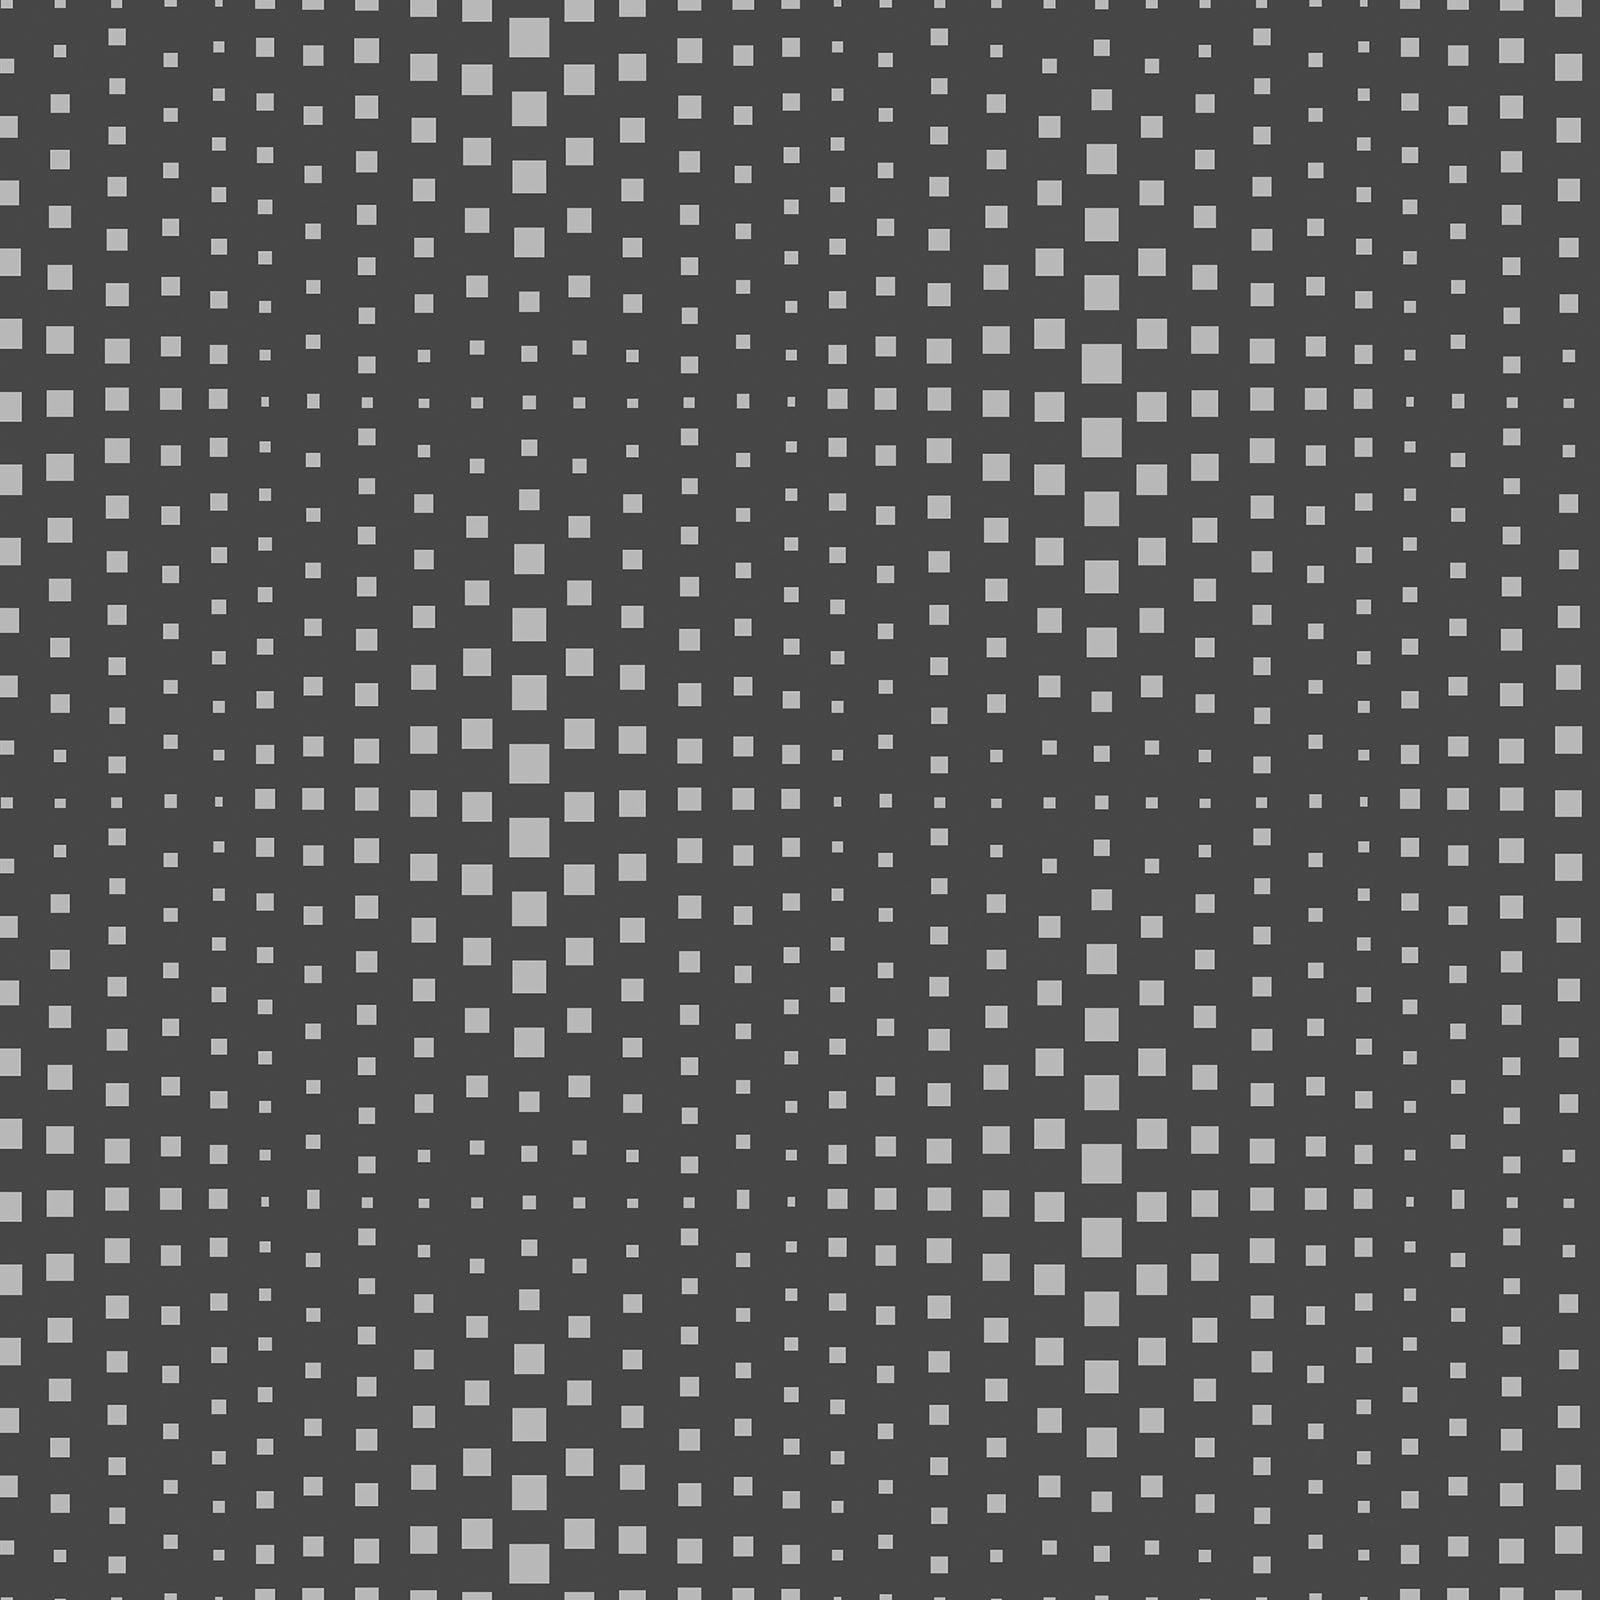 Op Squares Charcoal<br/>Contempo 3428-13